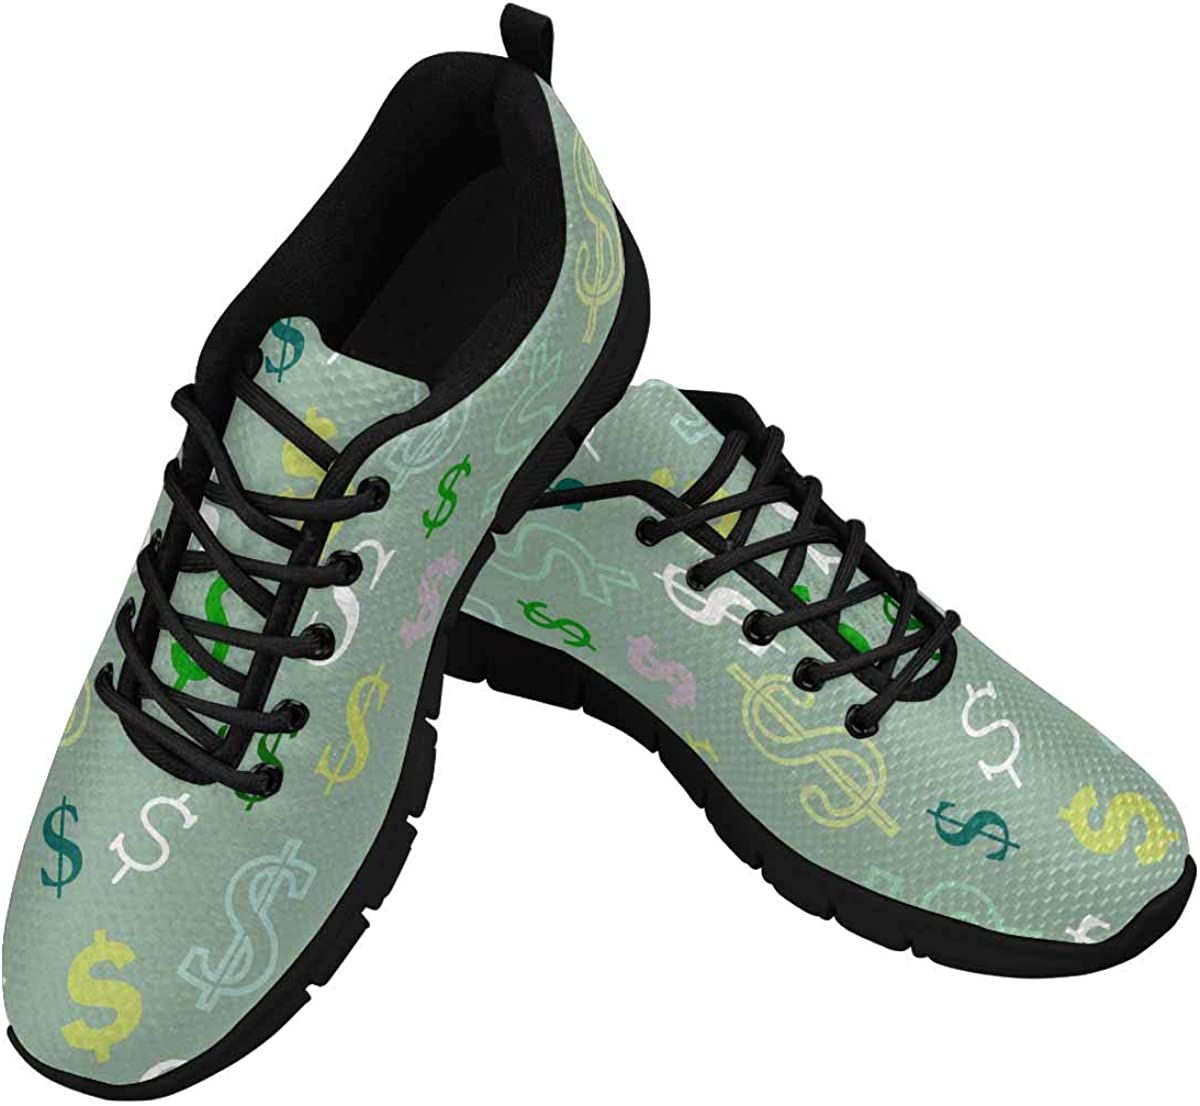 INTERESTPRINT Dollar Sign Pattern Women's Athletic Walking Running Sneakers Comfortable Lightweight Shoes